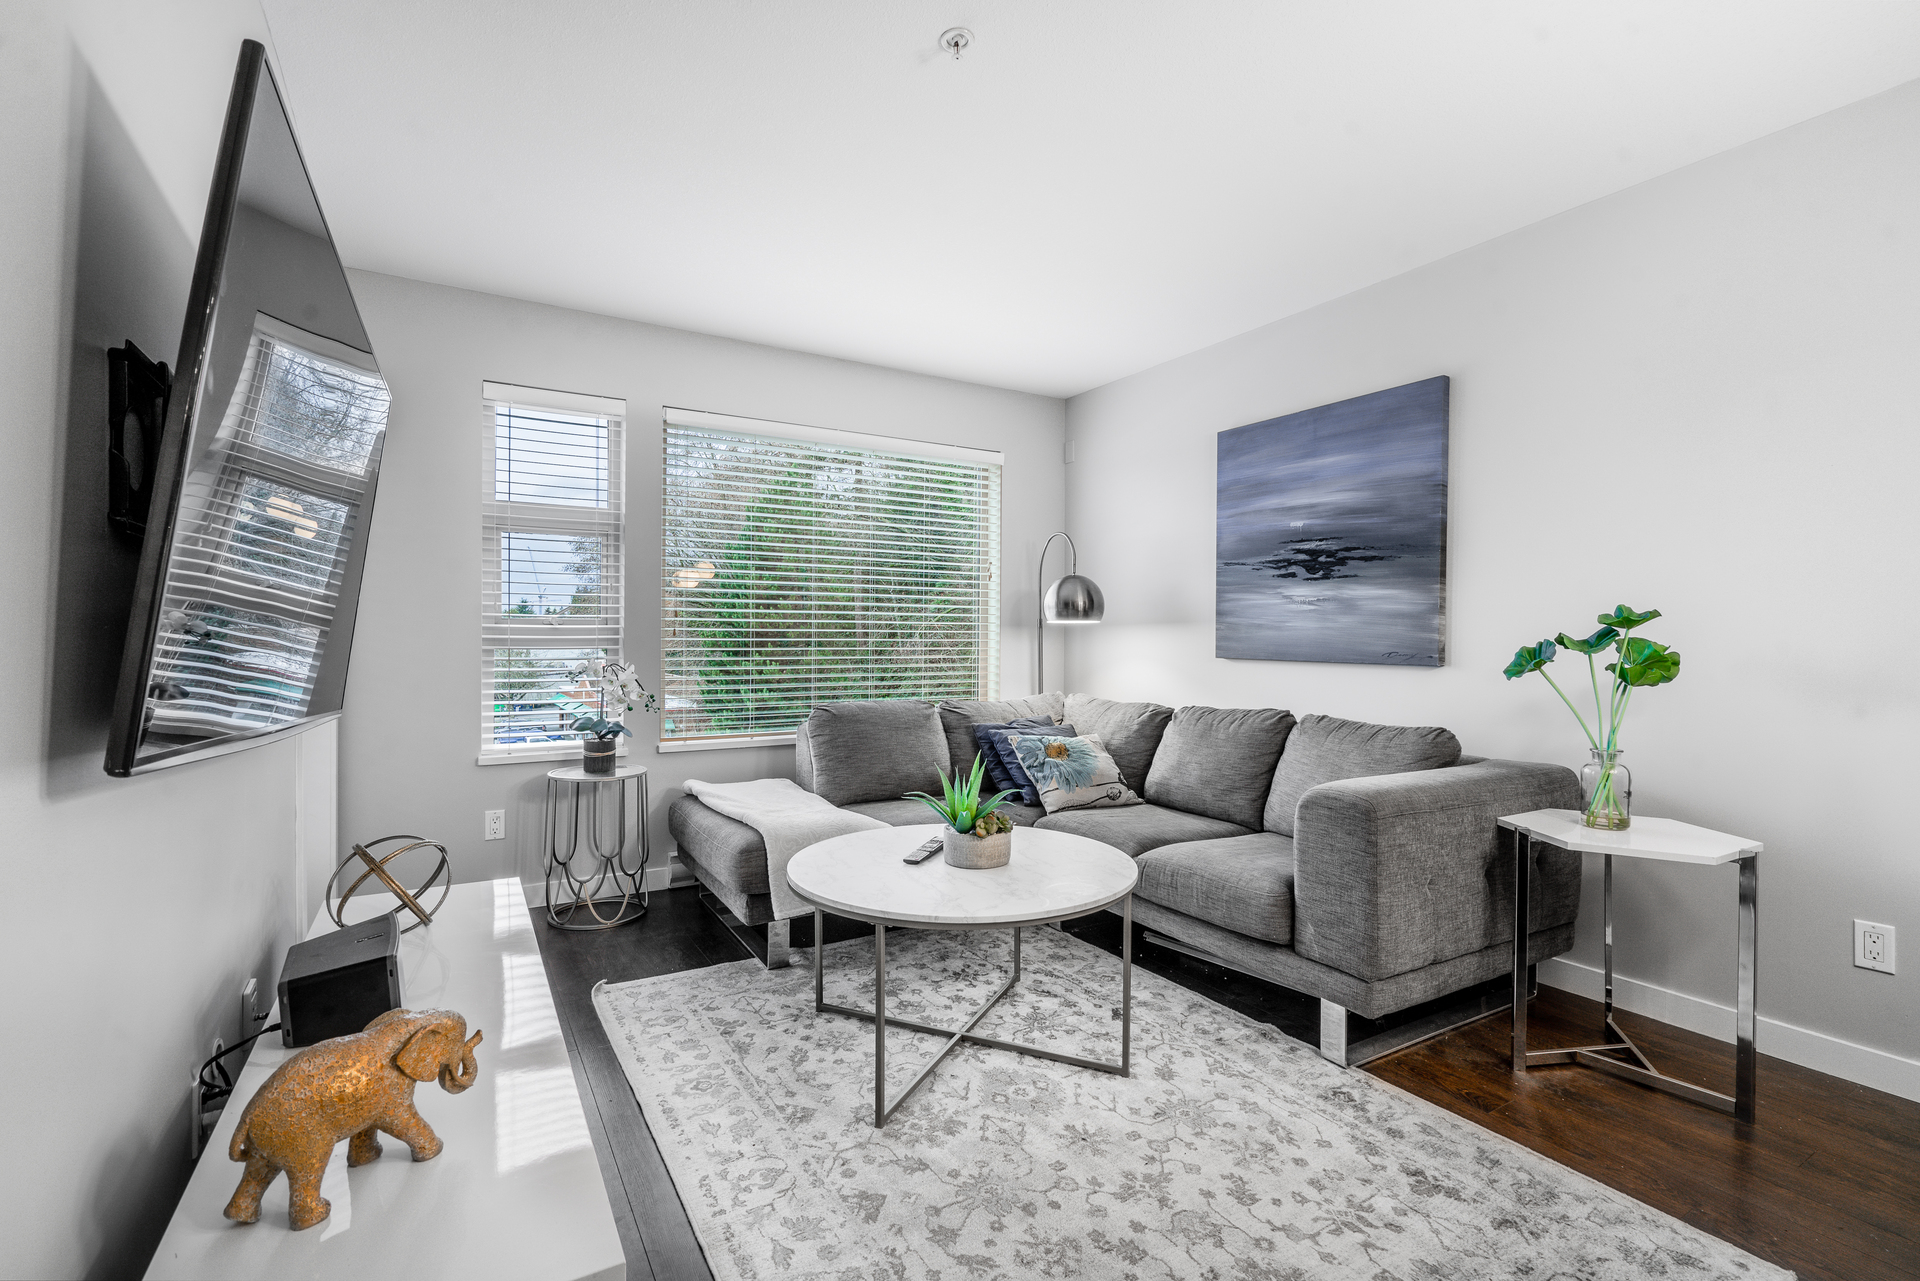 unit-410-1677-lloyd-avenue-north-vancouver-11 at 410 - 1677 Lloyd Avenue, Pemberton NV, North Vancouver